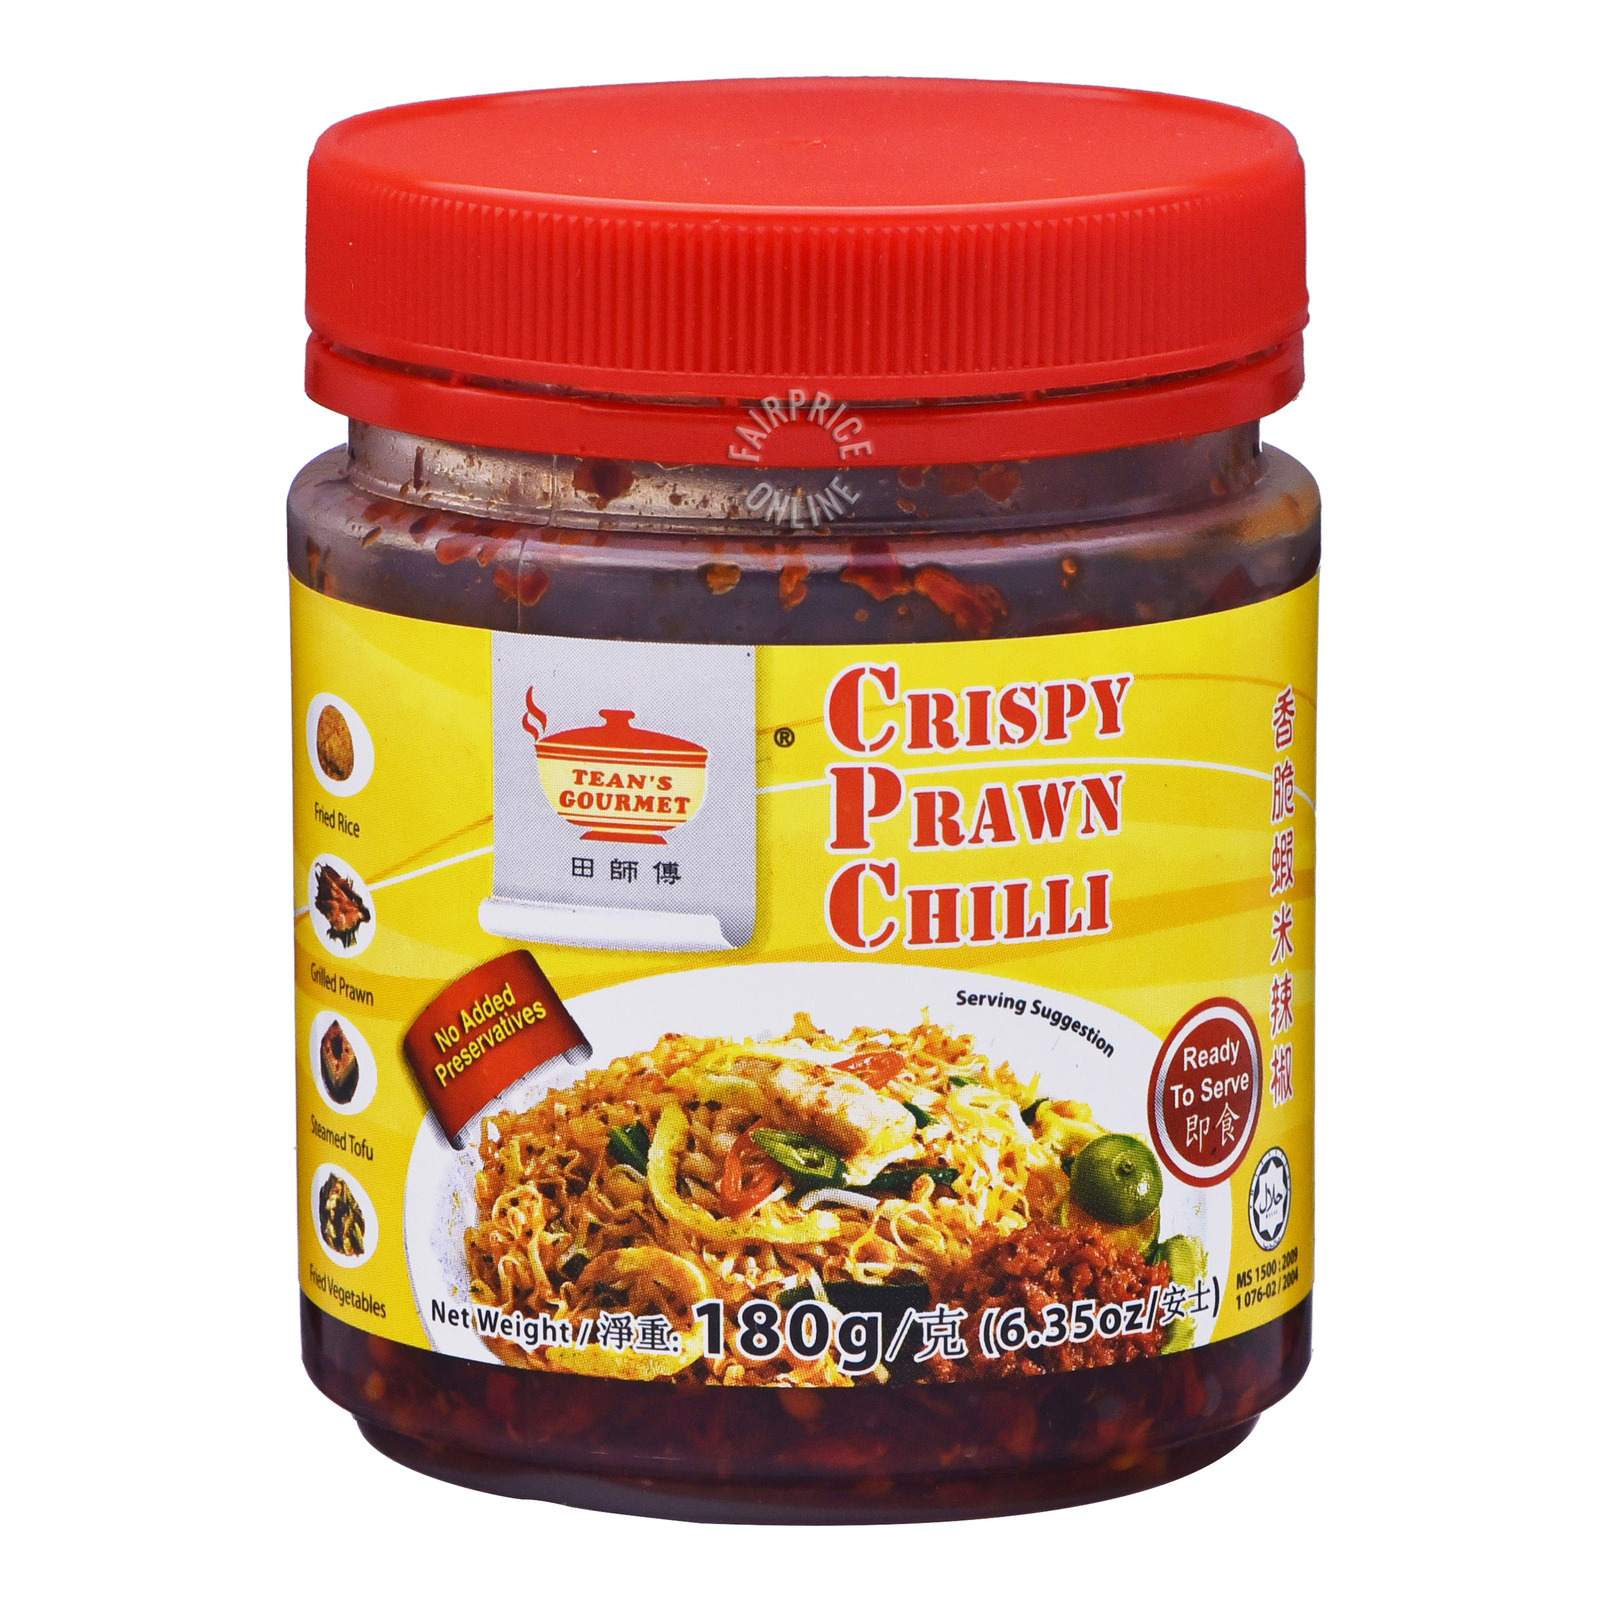 Tean's Gourmet Crispy Prawn Chili